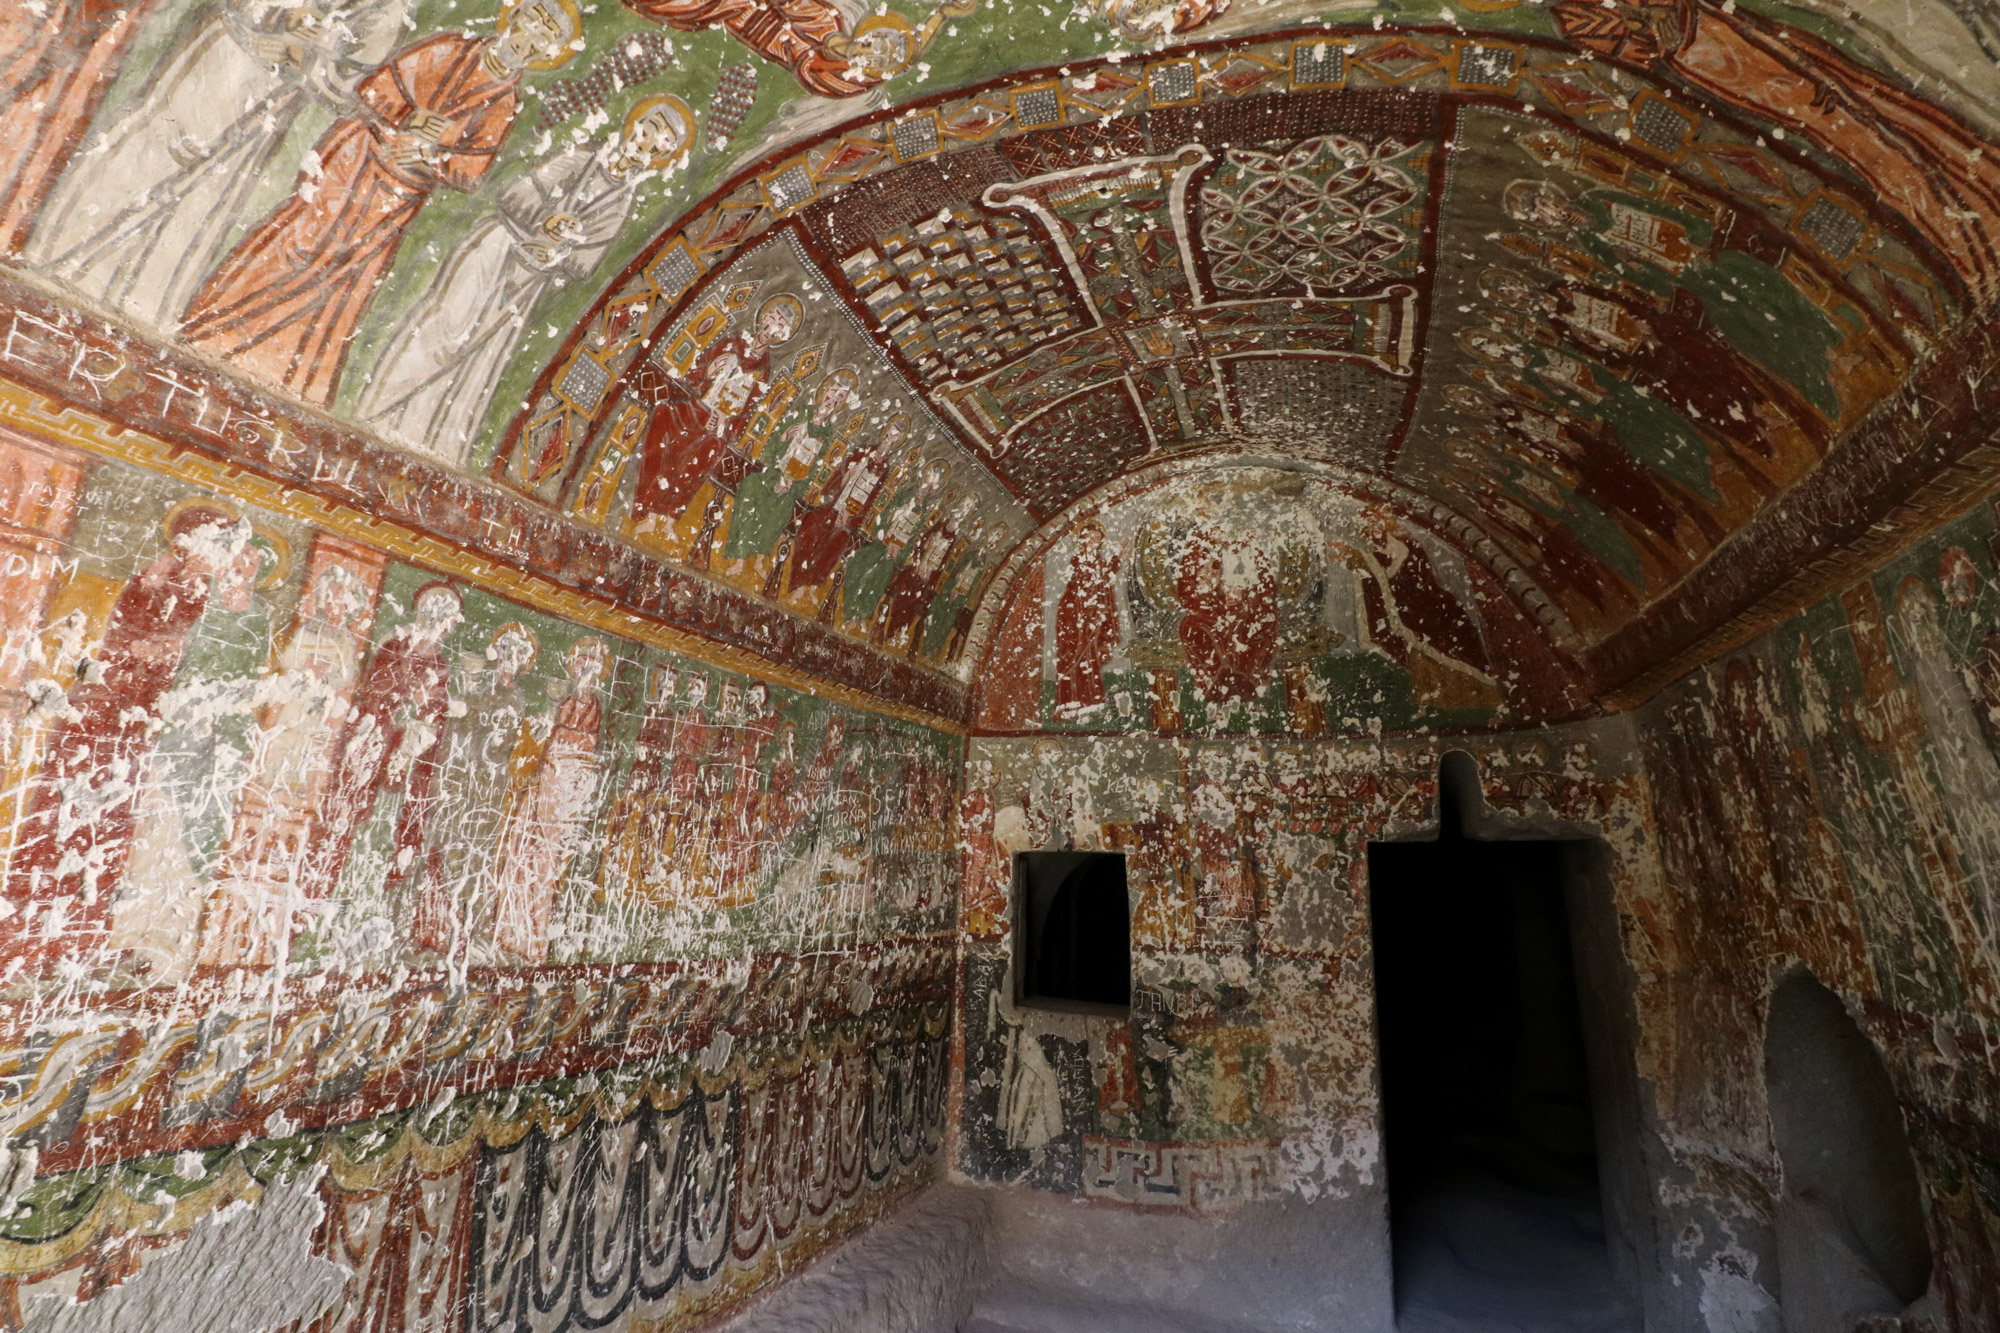 Turkije reisverslag: Laatste dag in Cappadocië - Wandeling in Ihlara Vadisi